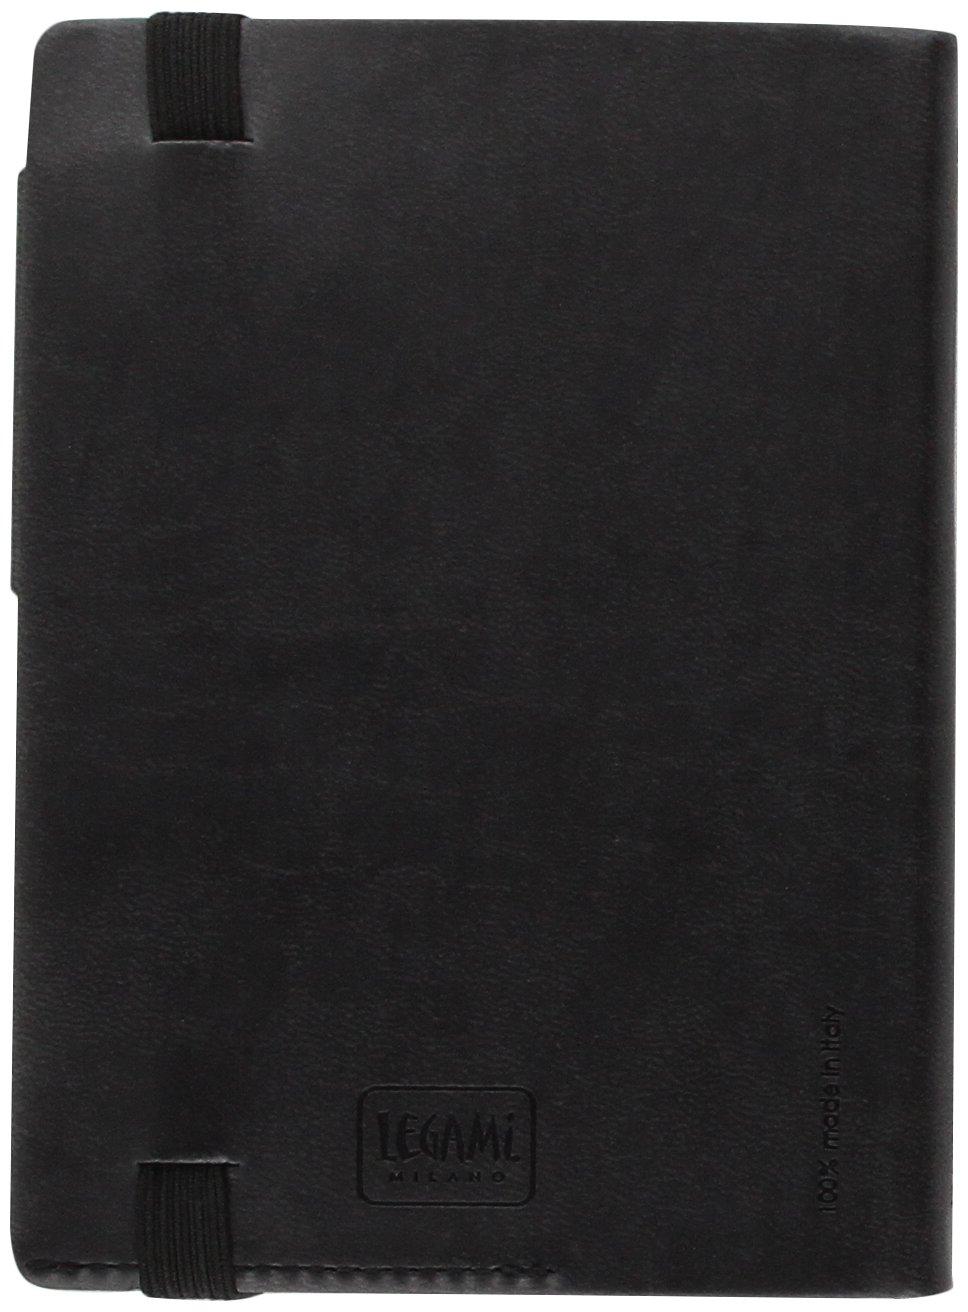 Amazon.com : Legami Small 12 Month 2017 Daily Diary - Apple ...